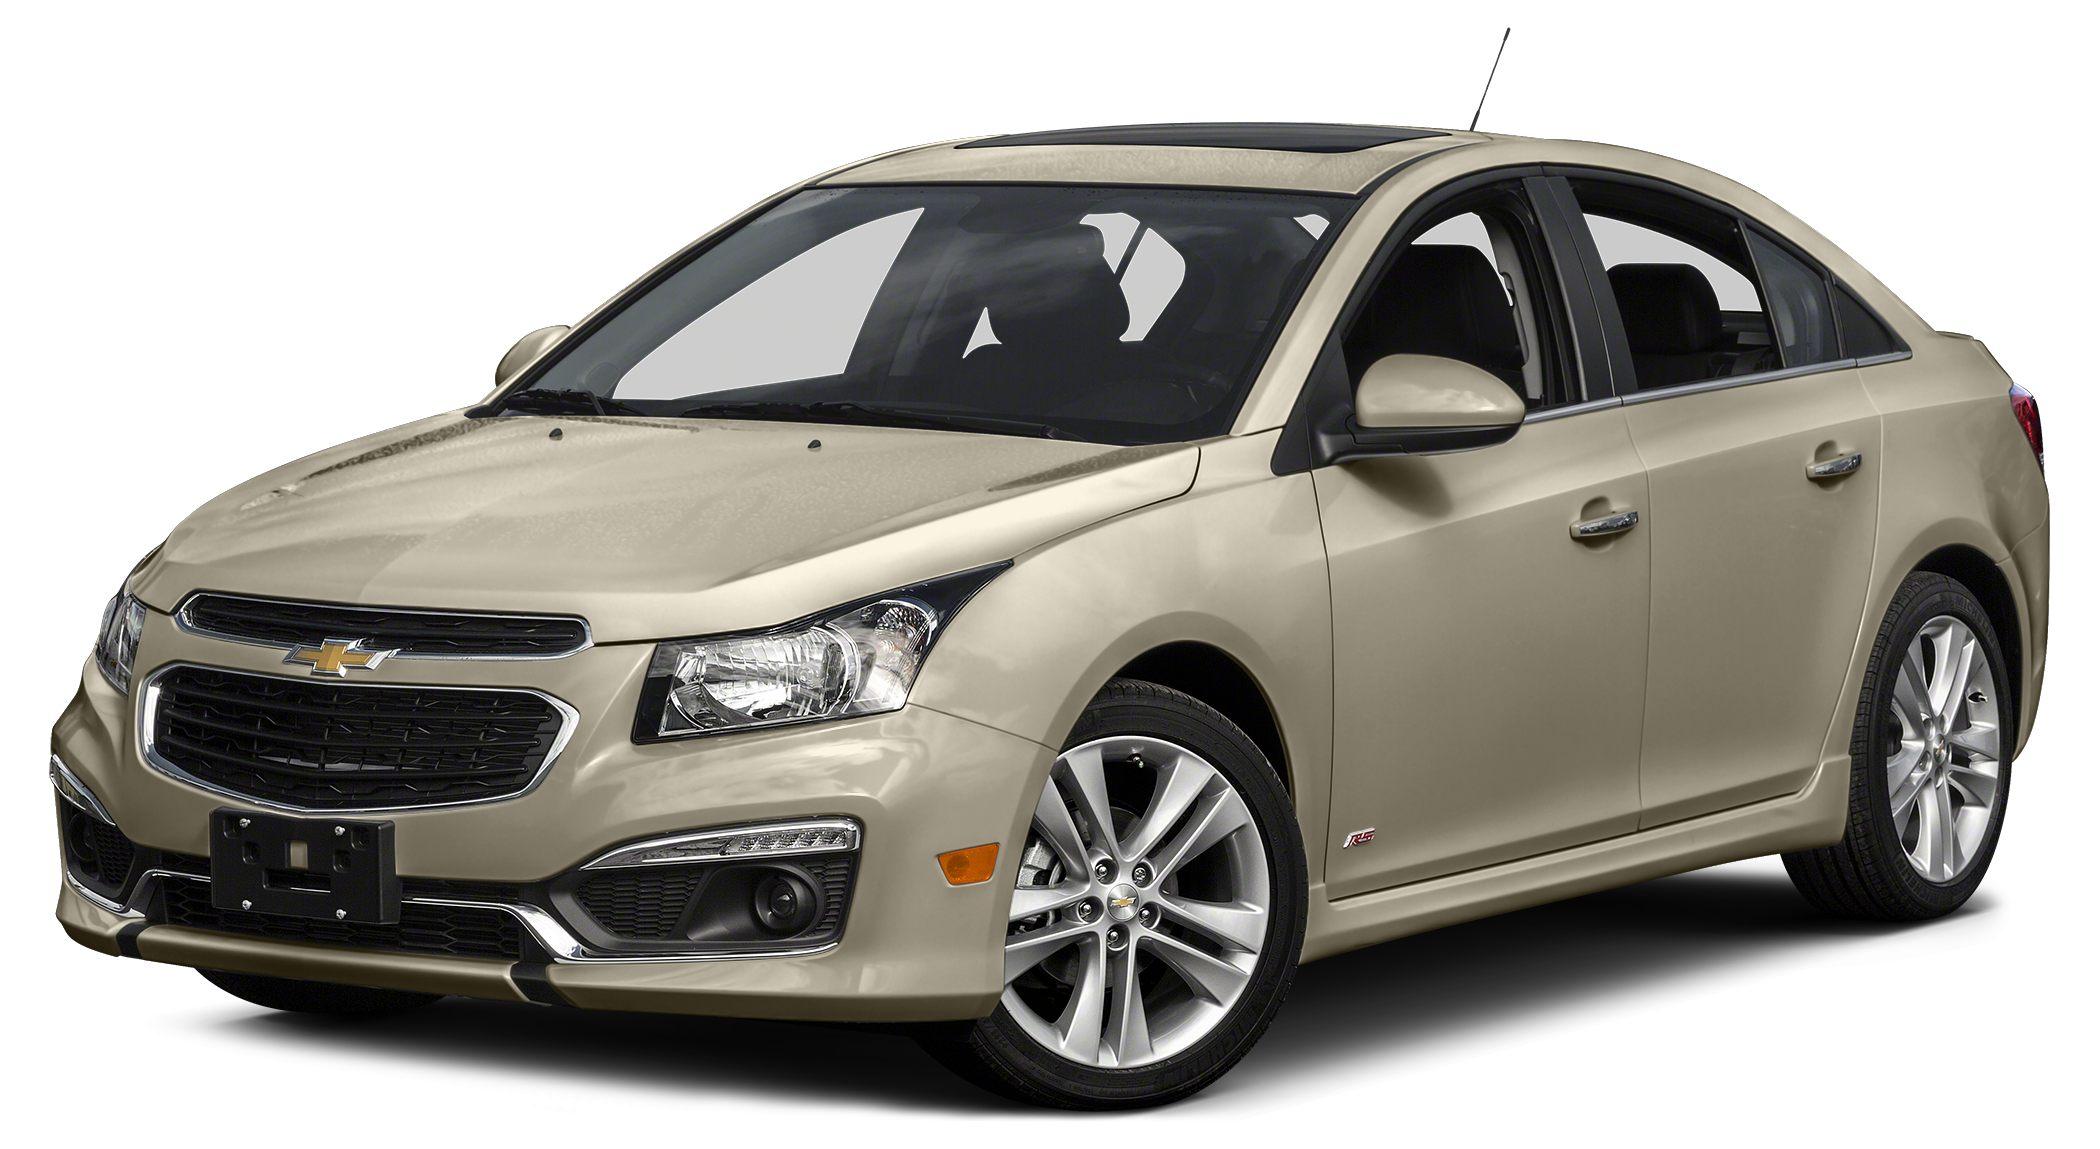 2015 Chevrolet Cruze 1LT 1LT Driver Convenience Package Auto-Dimming Inside Rear-View Mirror Dri